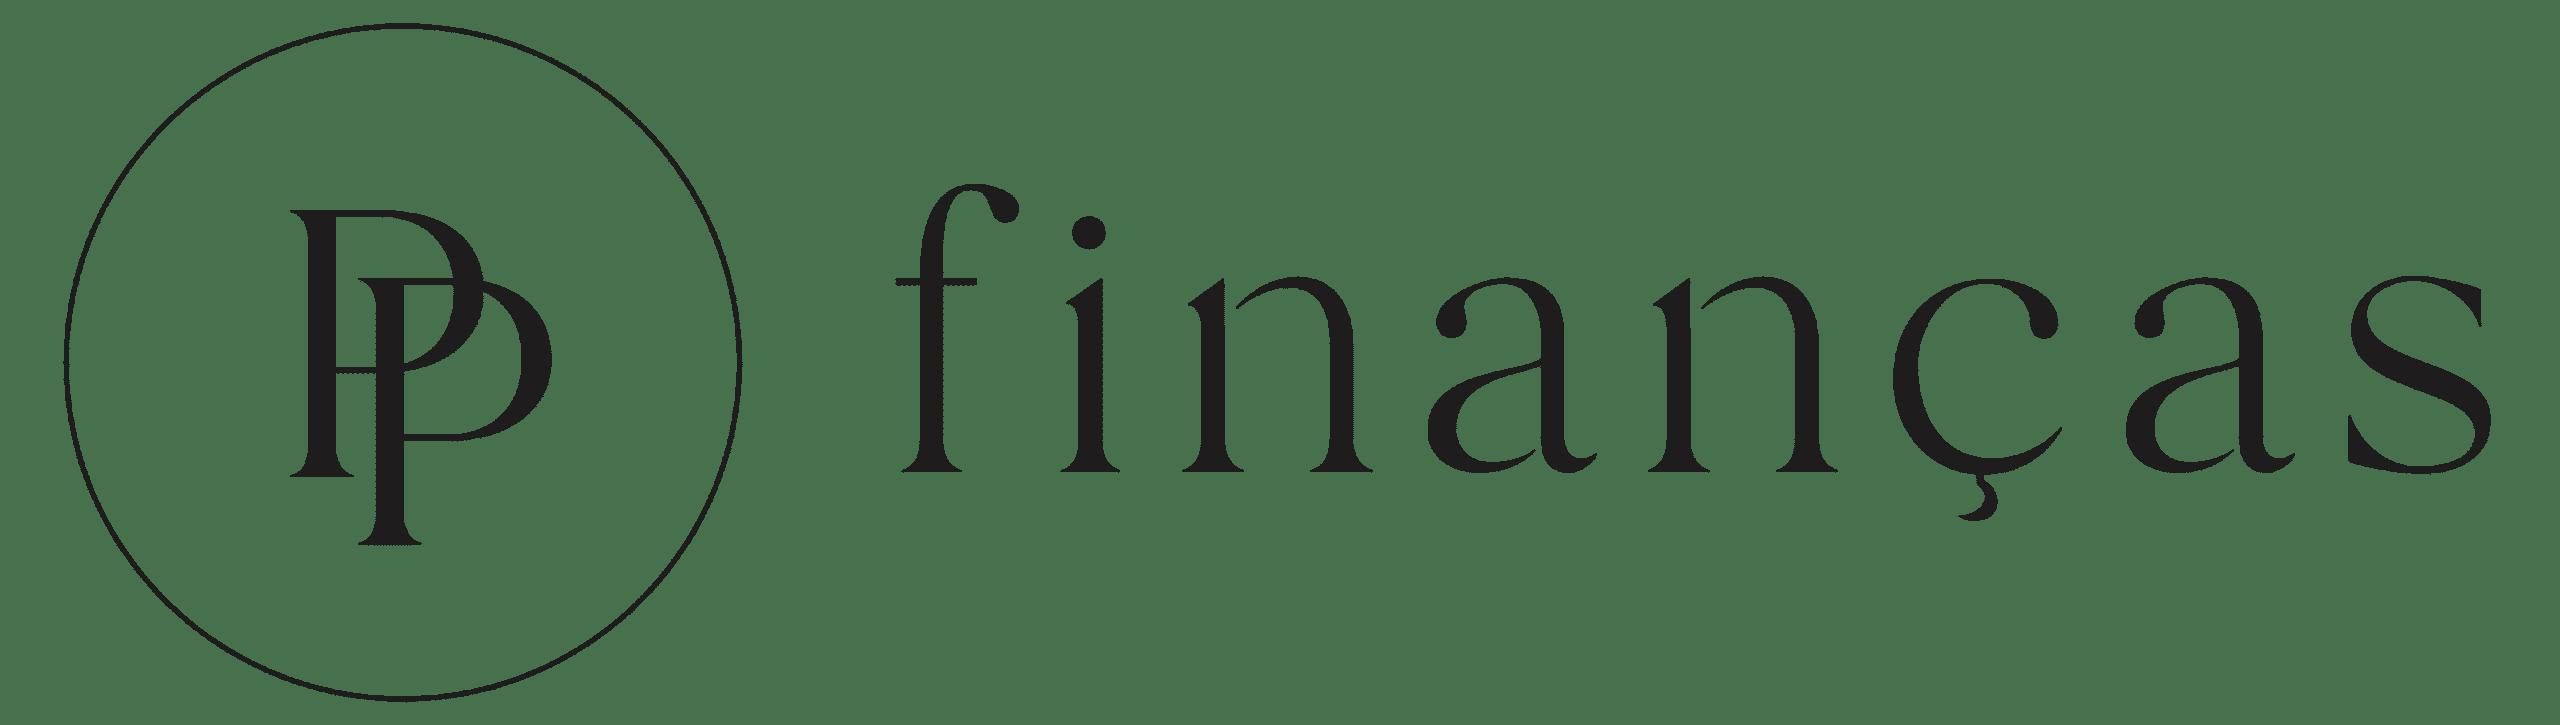 pp-financas_6